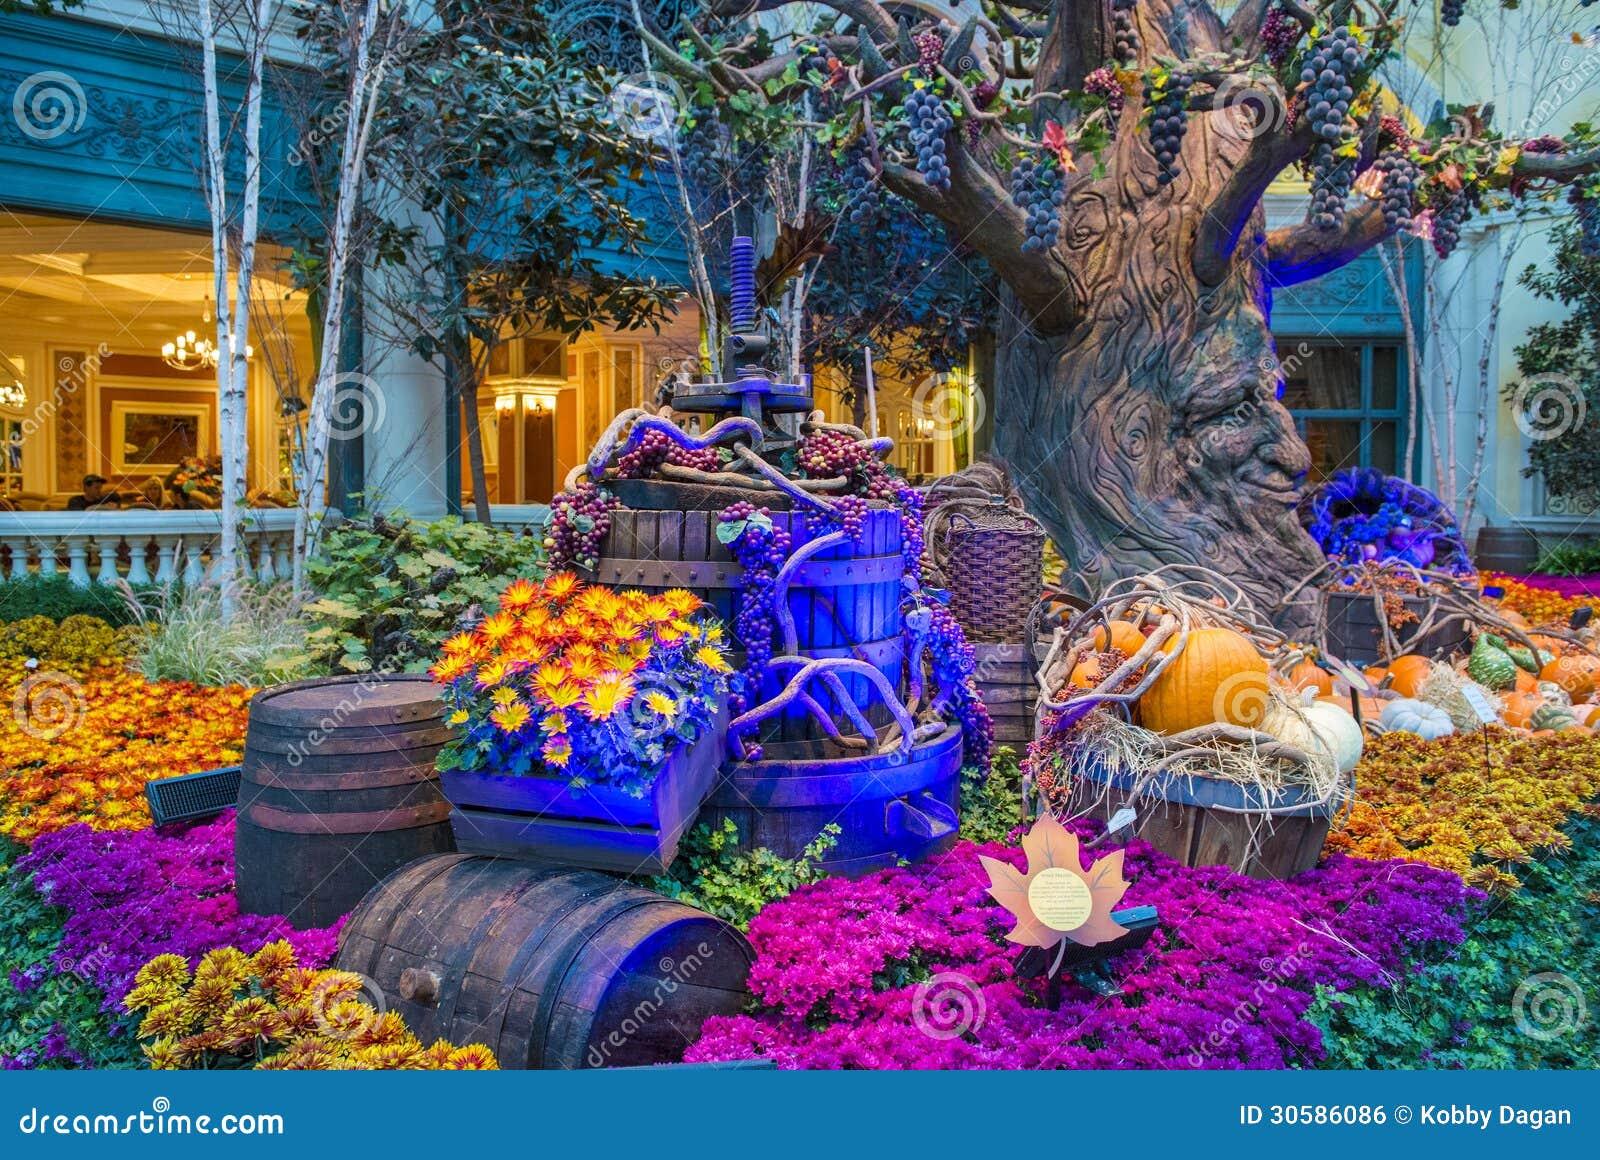 Bellagio Hotel Conservatory U0026 Botanical Gardens